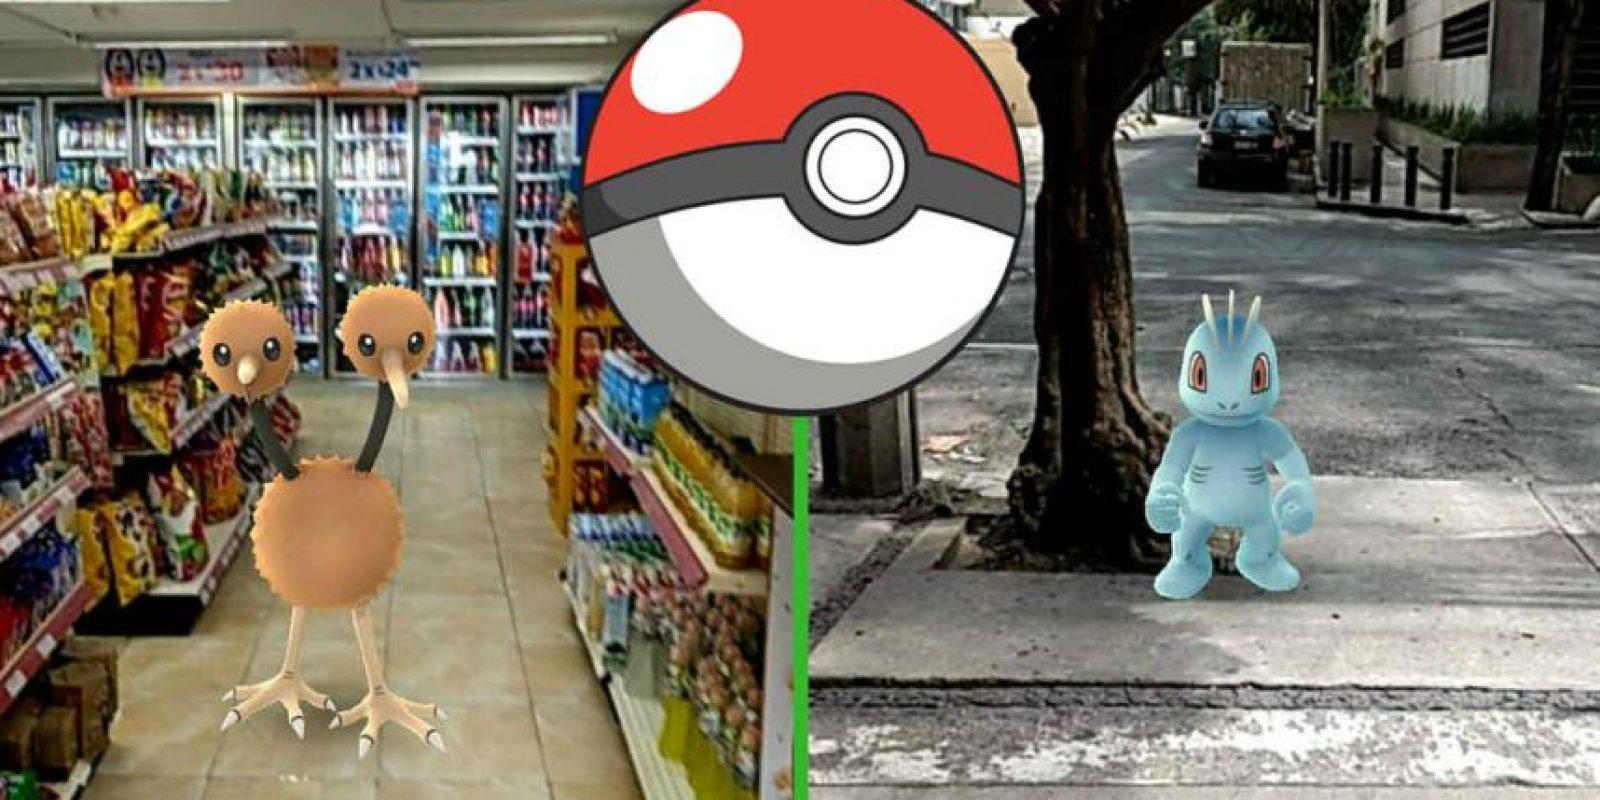 Las personas corren por las calles atrapando pokémon. Foto:Pokémon Go